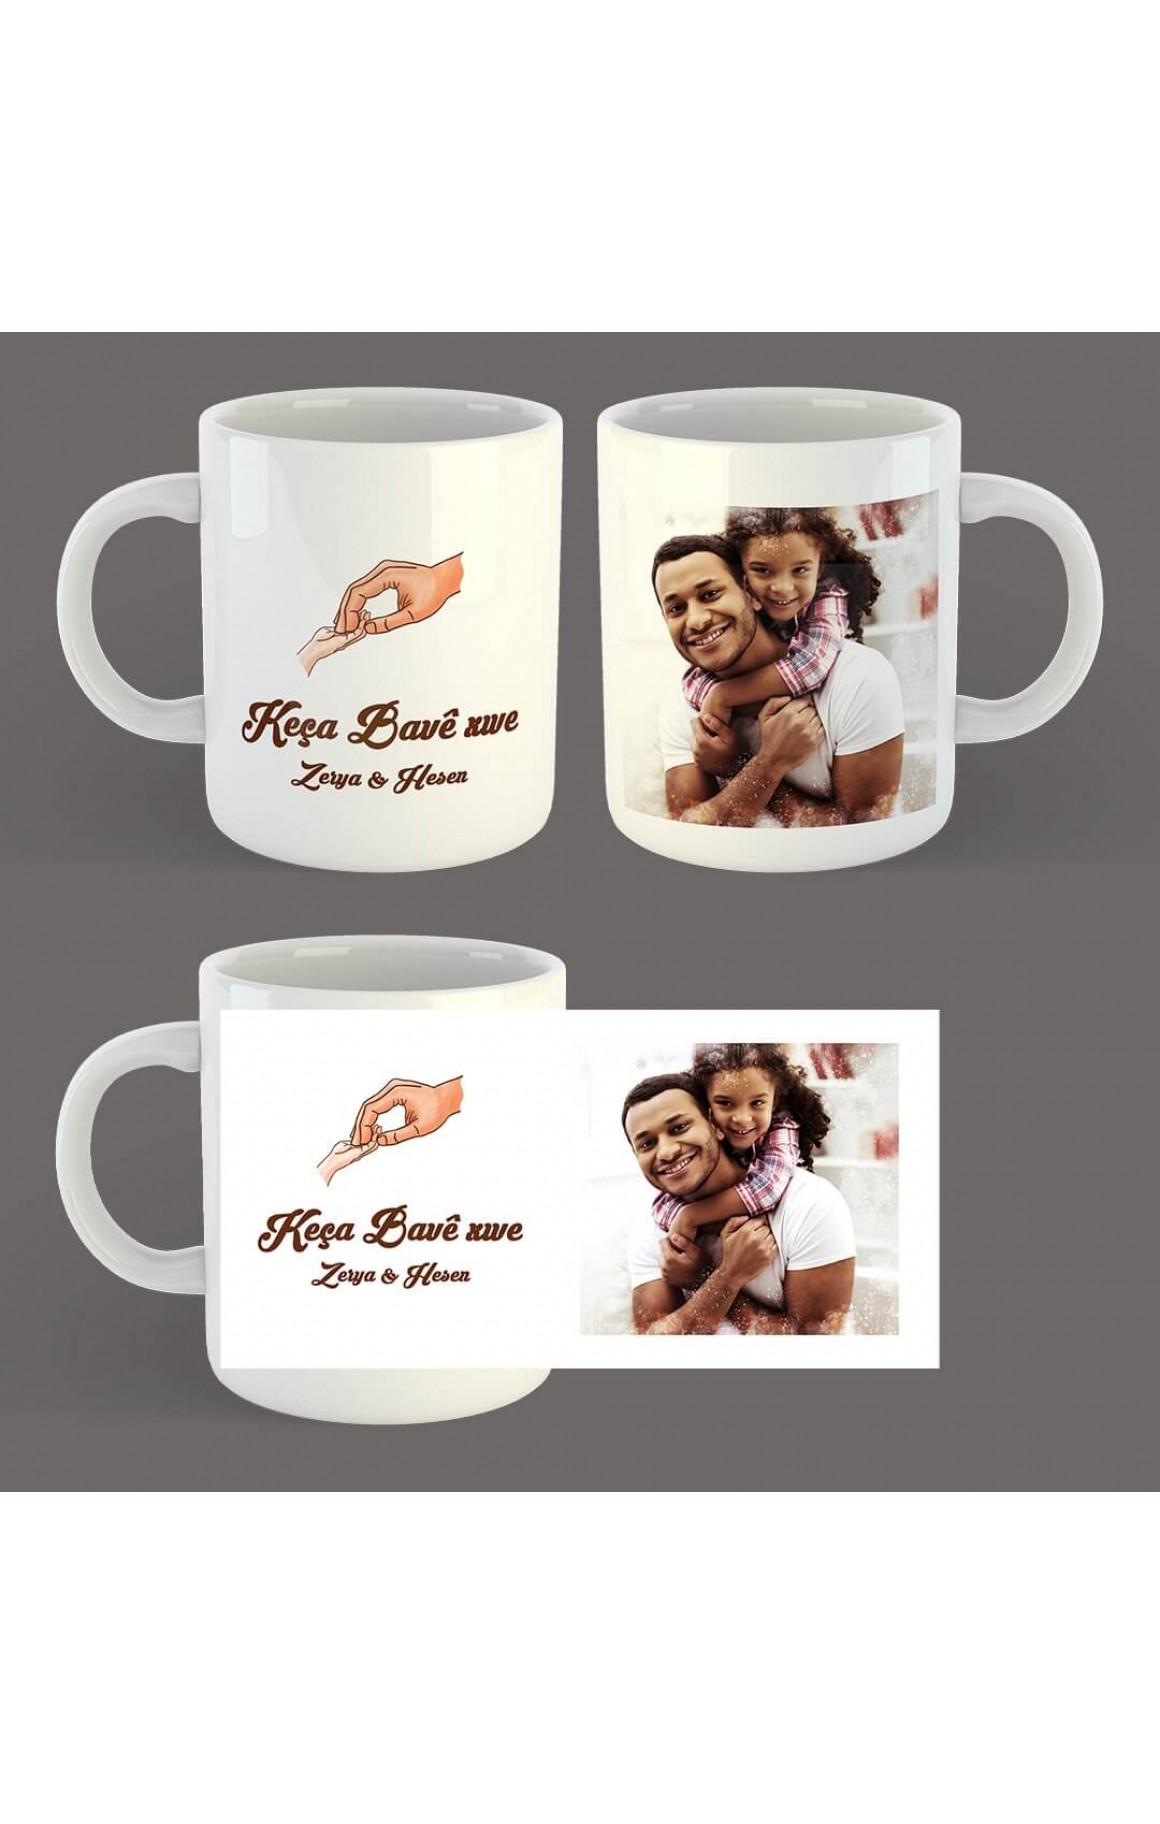 Babalara Özel Resimli ve İsimli Porselen Kupa - Keça Bavê Xwe